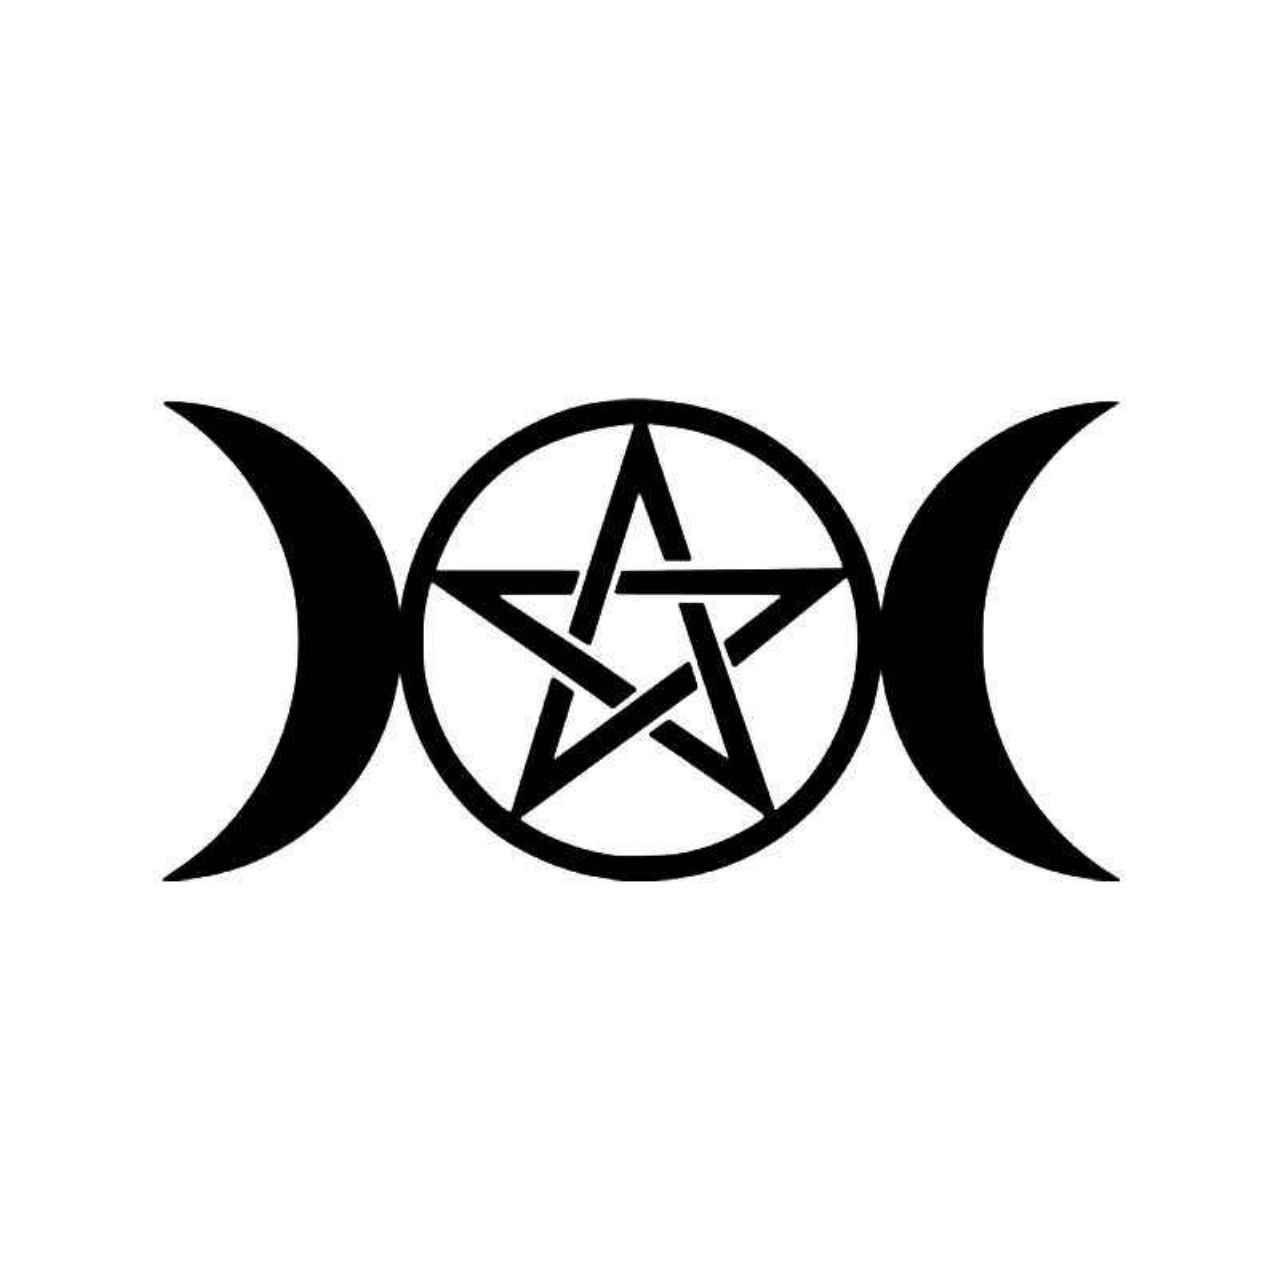 Triple Moon Goddess Wicca Pentacle Pagan Symbol Vinyl